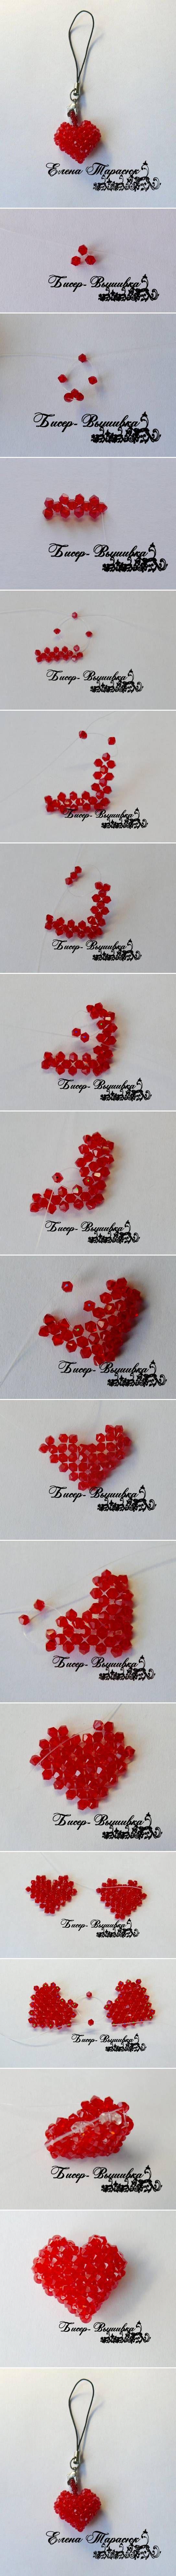 DIY Beads Heart Ornament DIY Projects | UsefulDIY.com Follow Us on Facebook ==> http://www.facebook.com/UsefulDiy